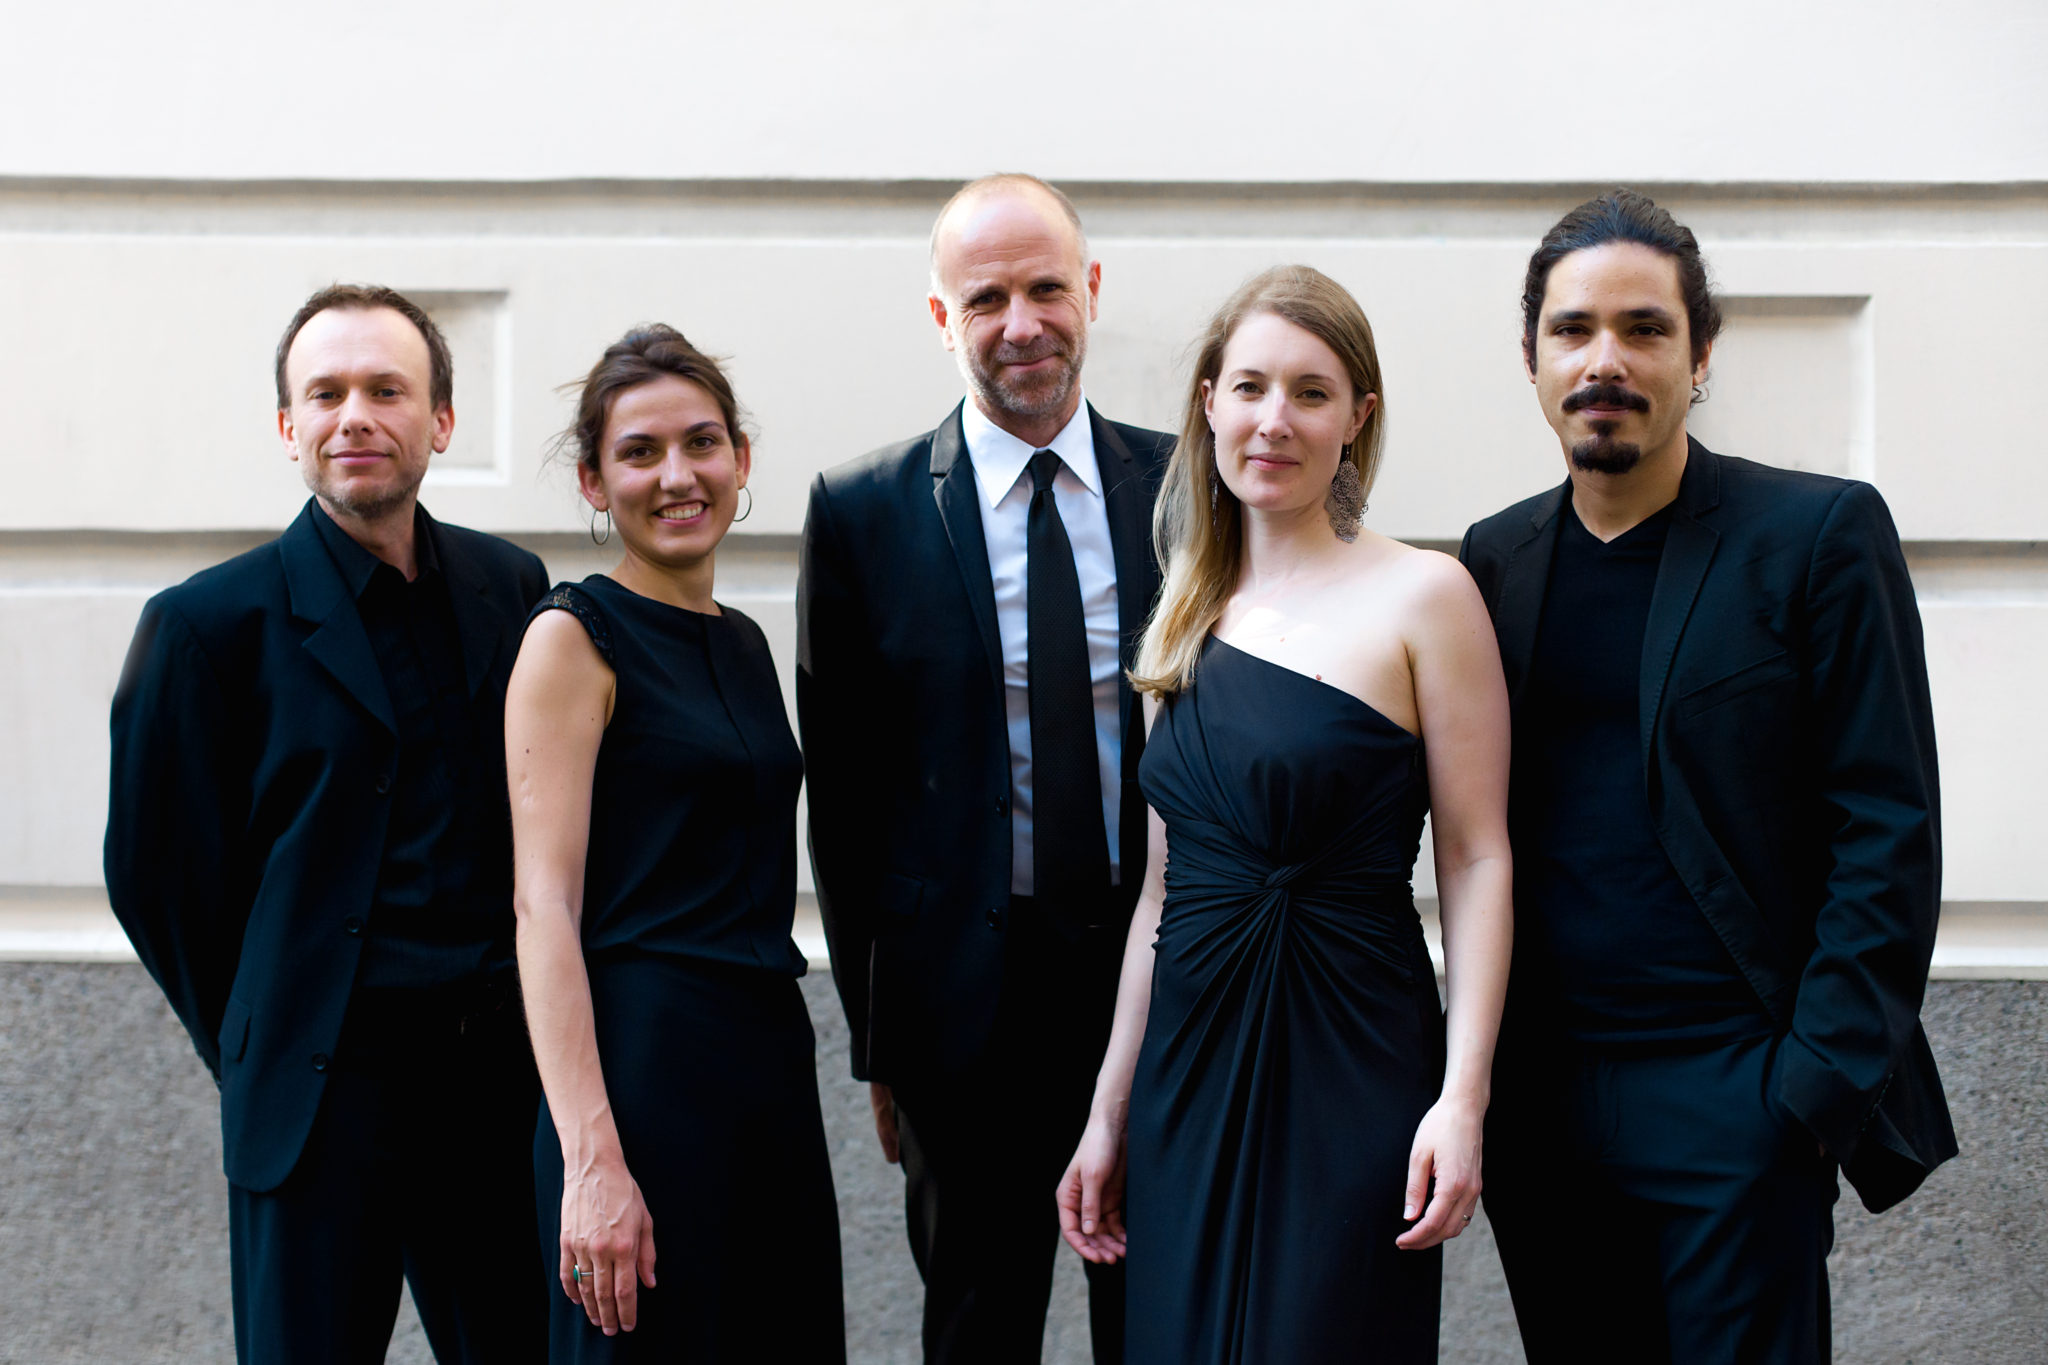 concert-hostel-dieu-baroque-au-feminin-a-cinq-credit-Julie-Cherki-2-hd